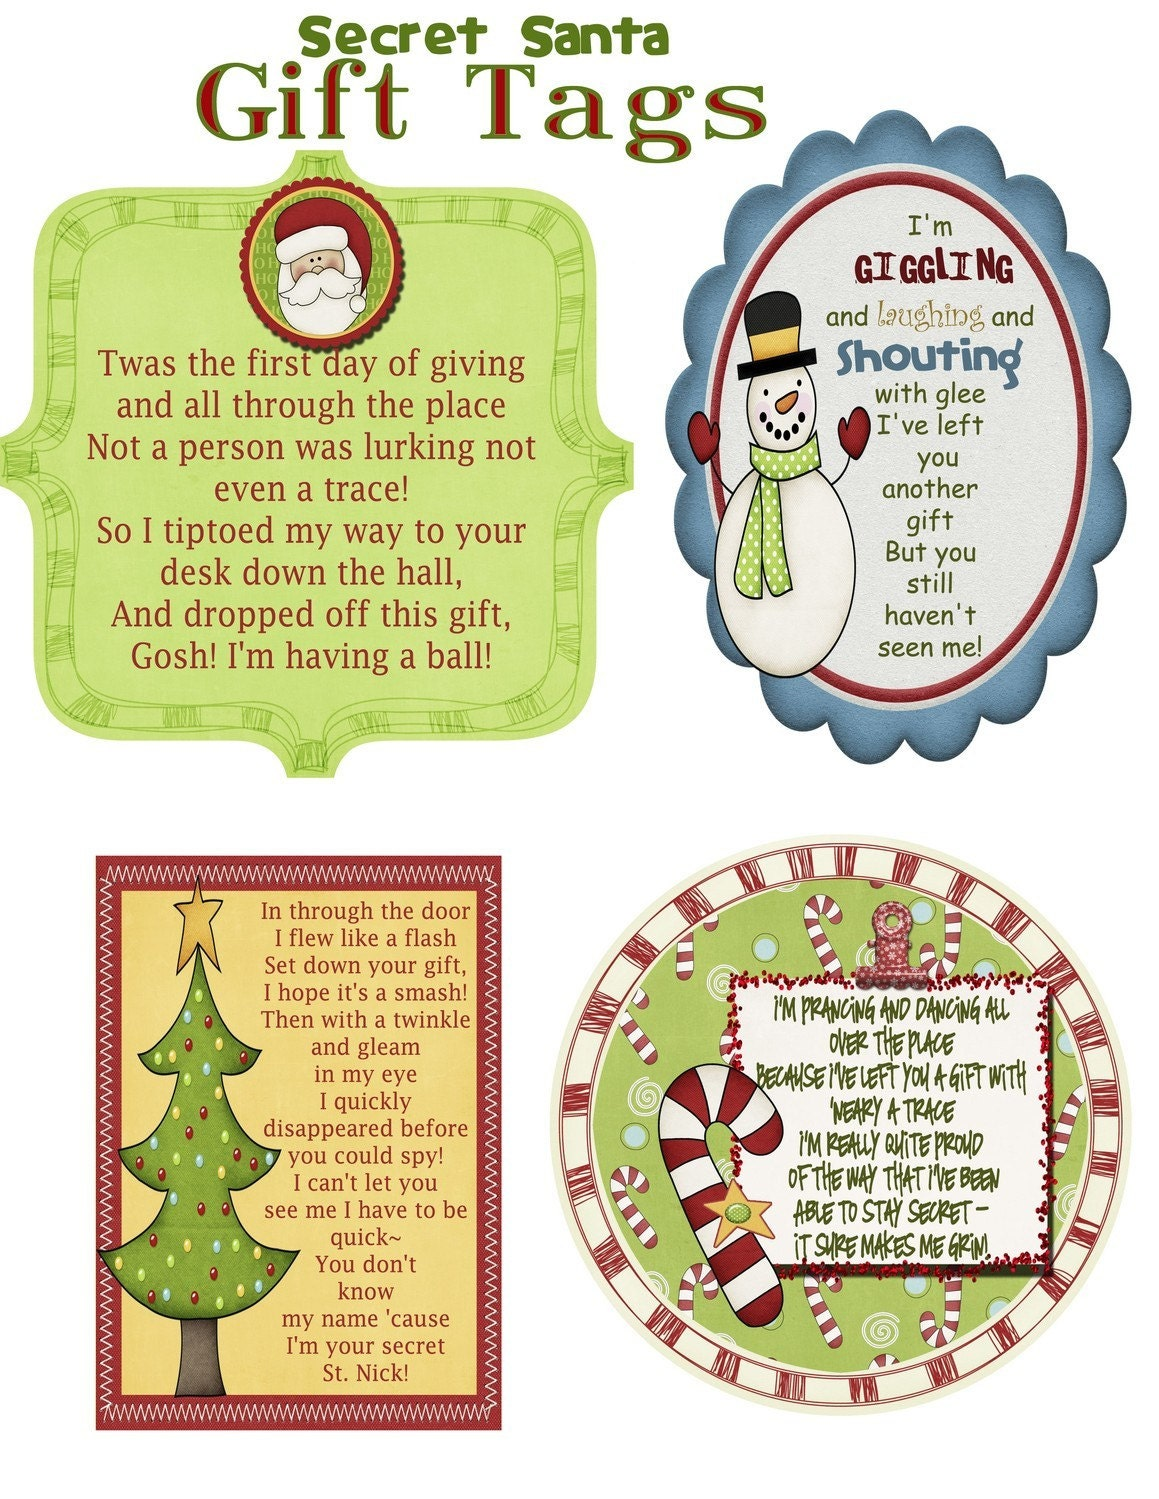 Secret Santa Gift Tag Poem PDF File by kate42876 on Etsy